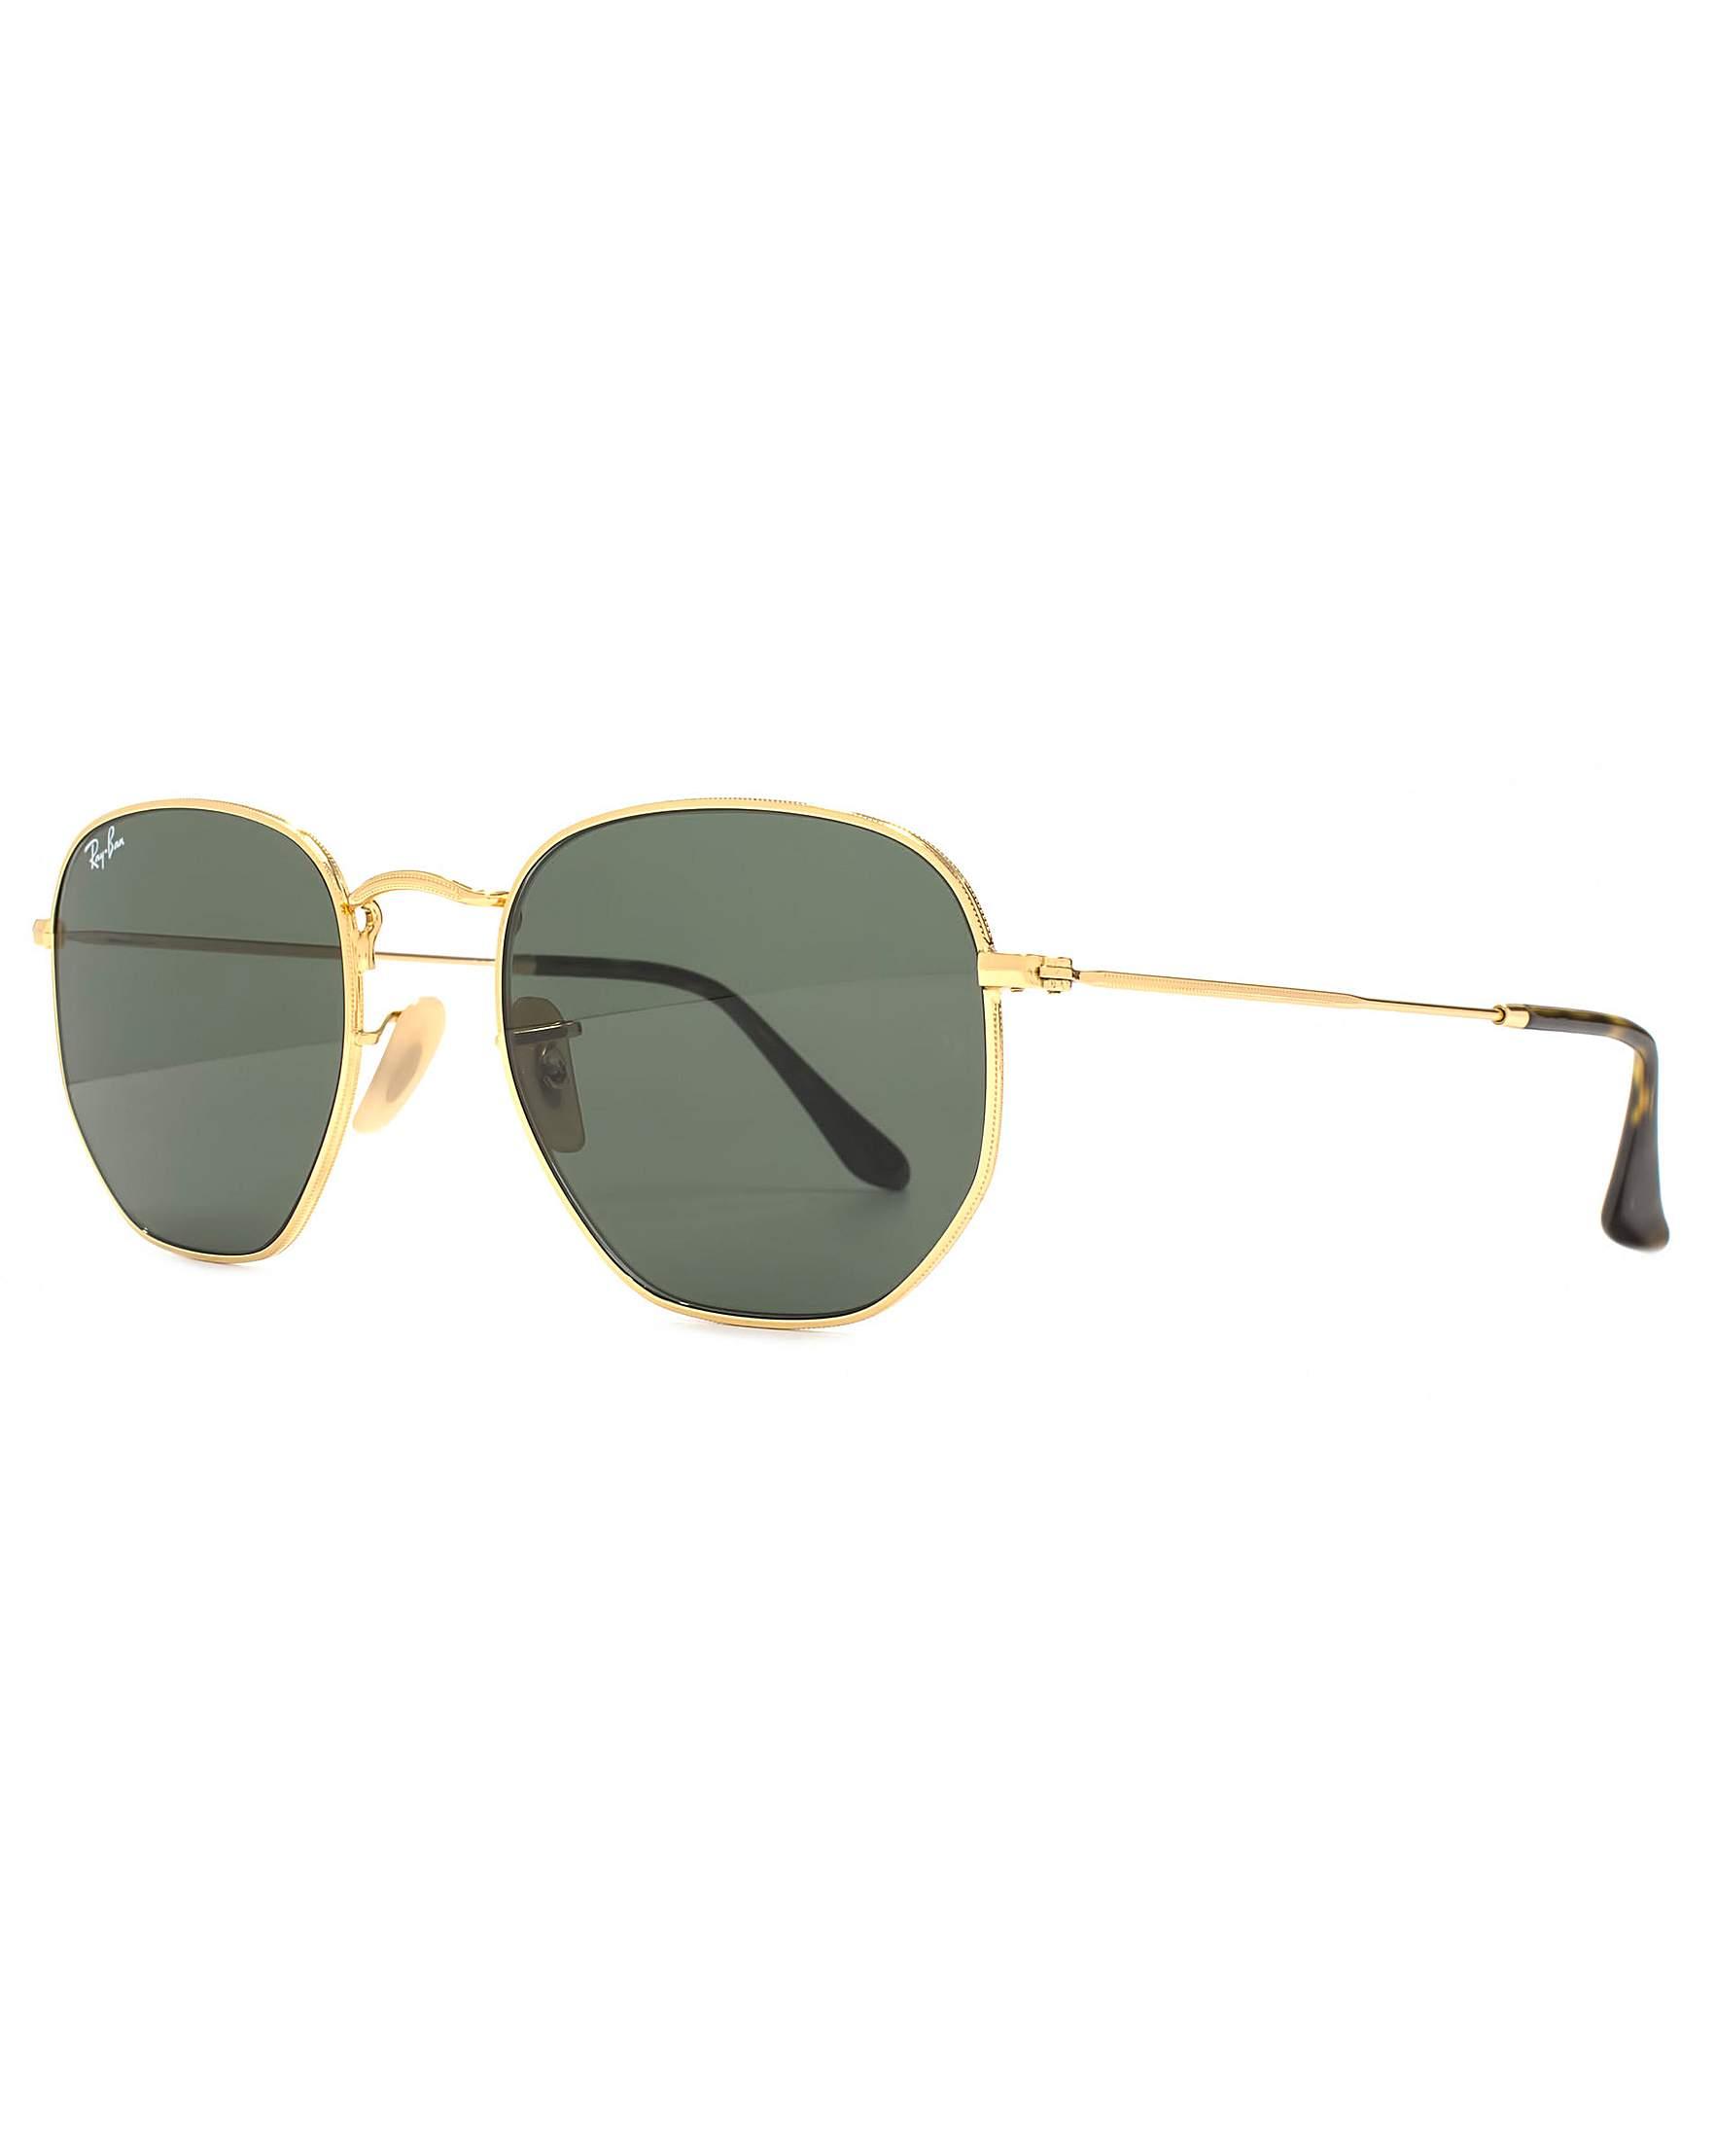 346302b3cb55 Adidas Sunglasses Parts Nz « One More Soul